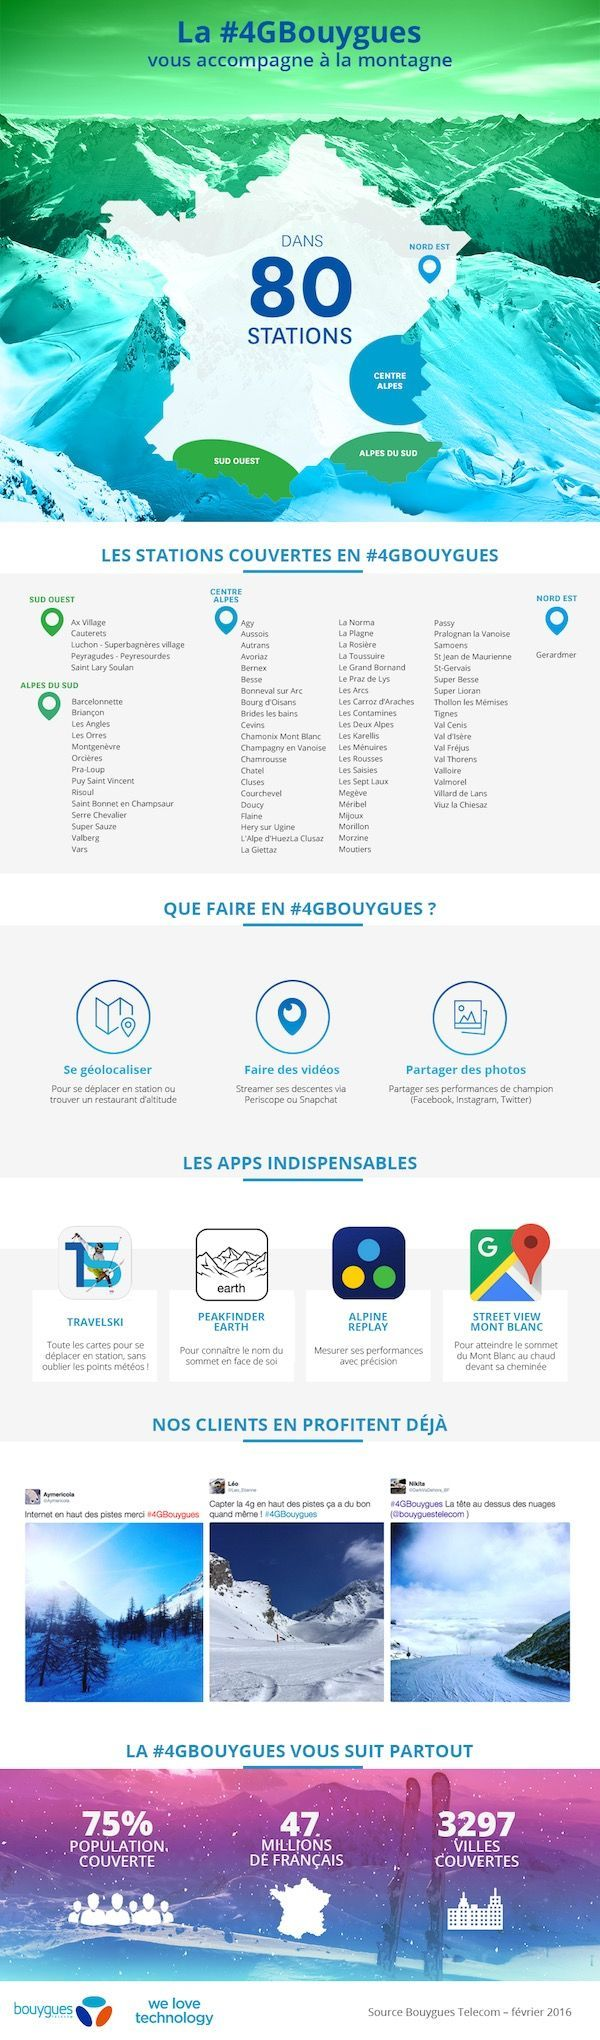 Bouygues-Telecom-4G-Ski-2016